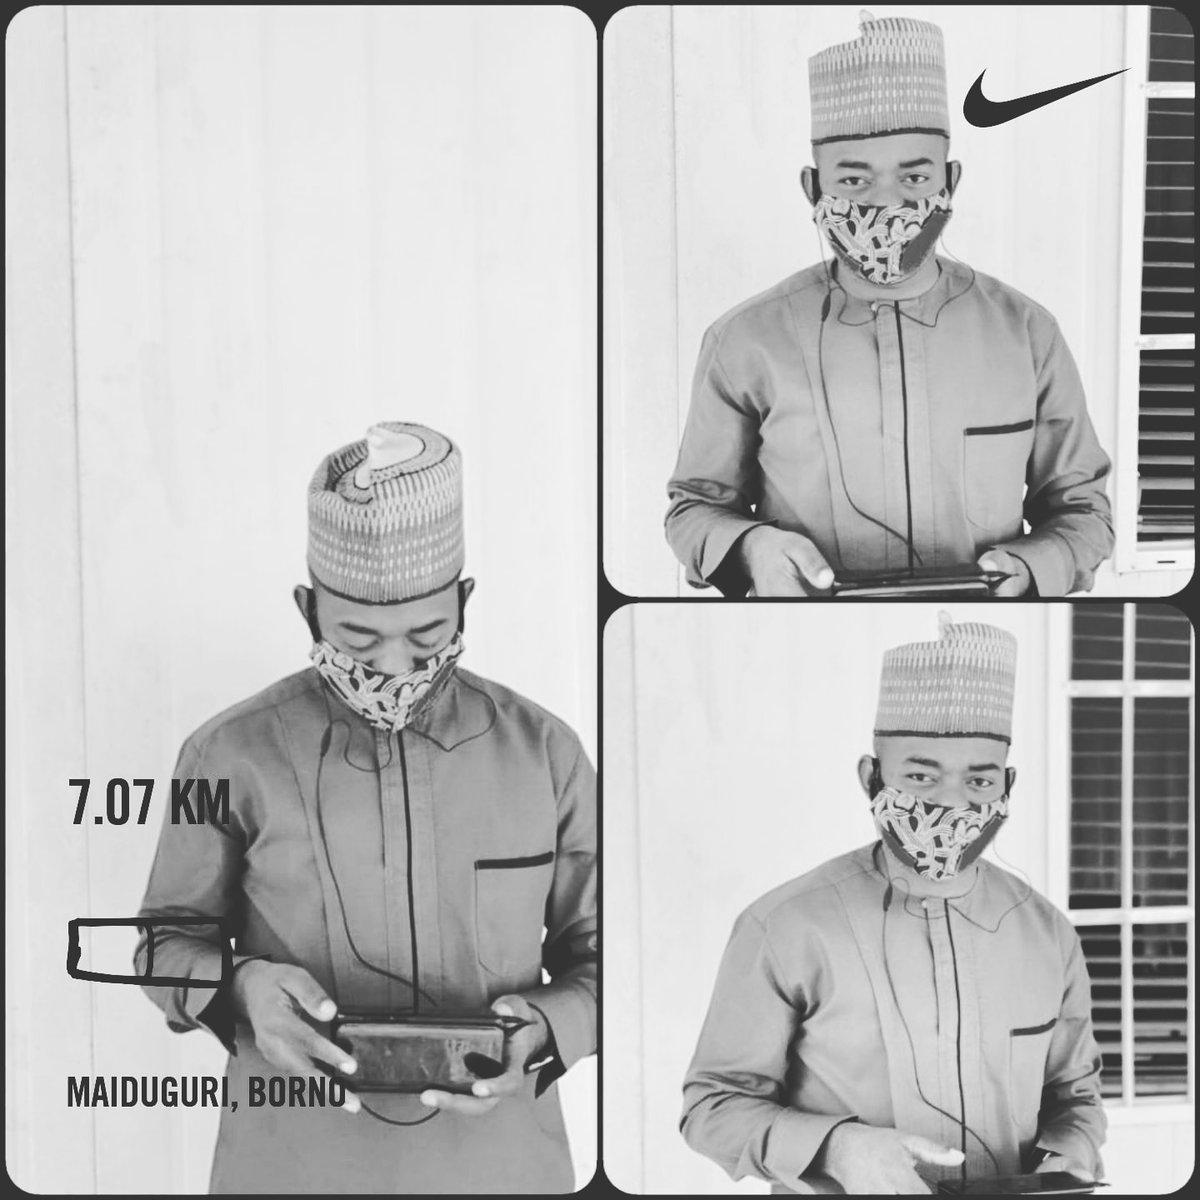 7.07km completed.   I rep Team Prefab.  #naijaFittest #runner #nikeplus #fitfam #strava #GoogleFit #itsAmarathon #ItsALifestyle #IamAccountable #yourturn   ✌🏃♂️💪🔥🇳🇬👌✅